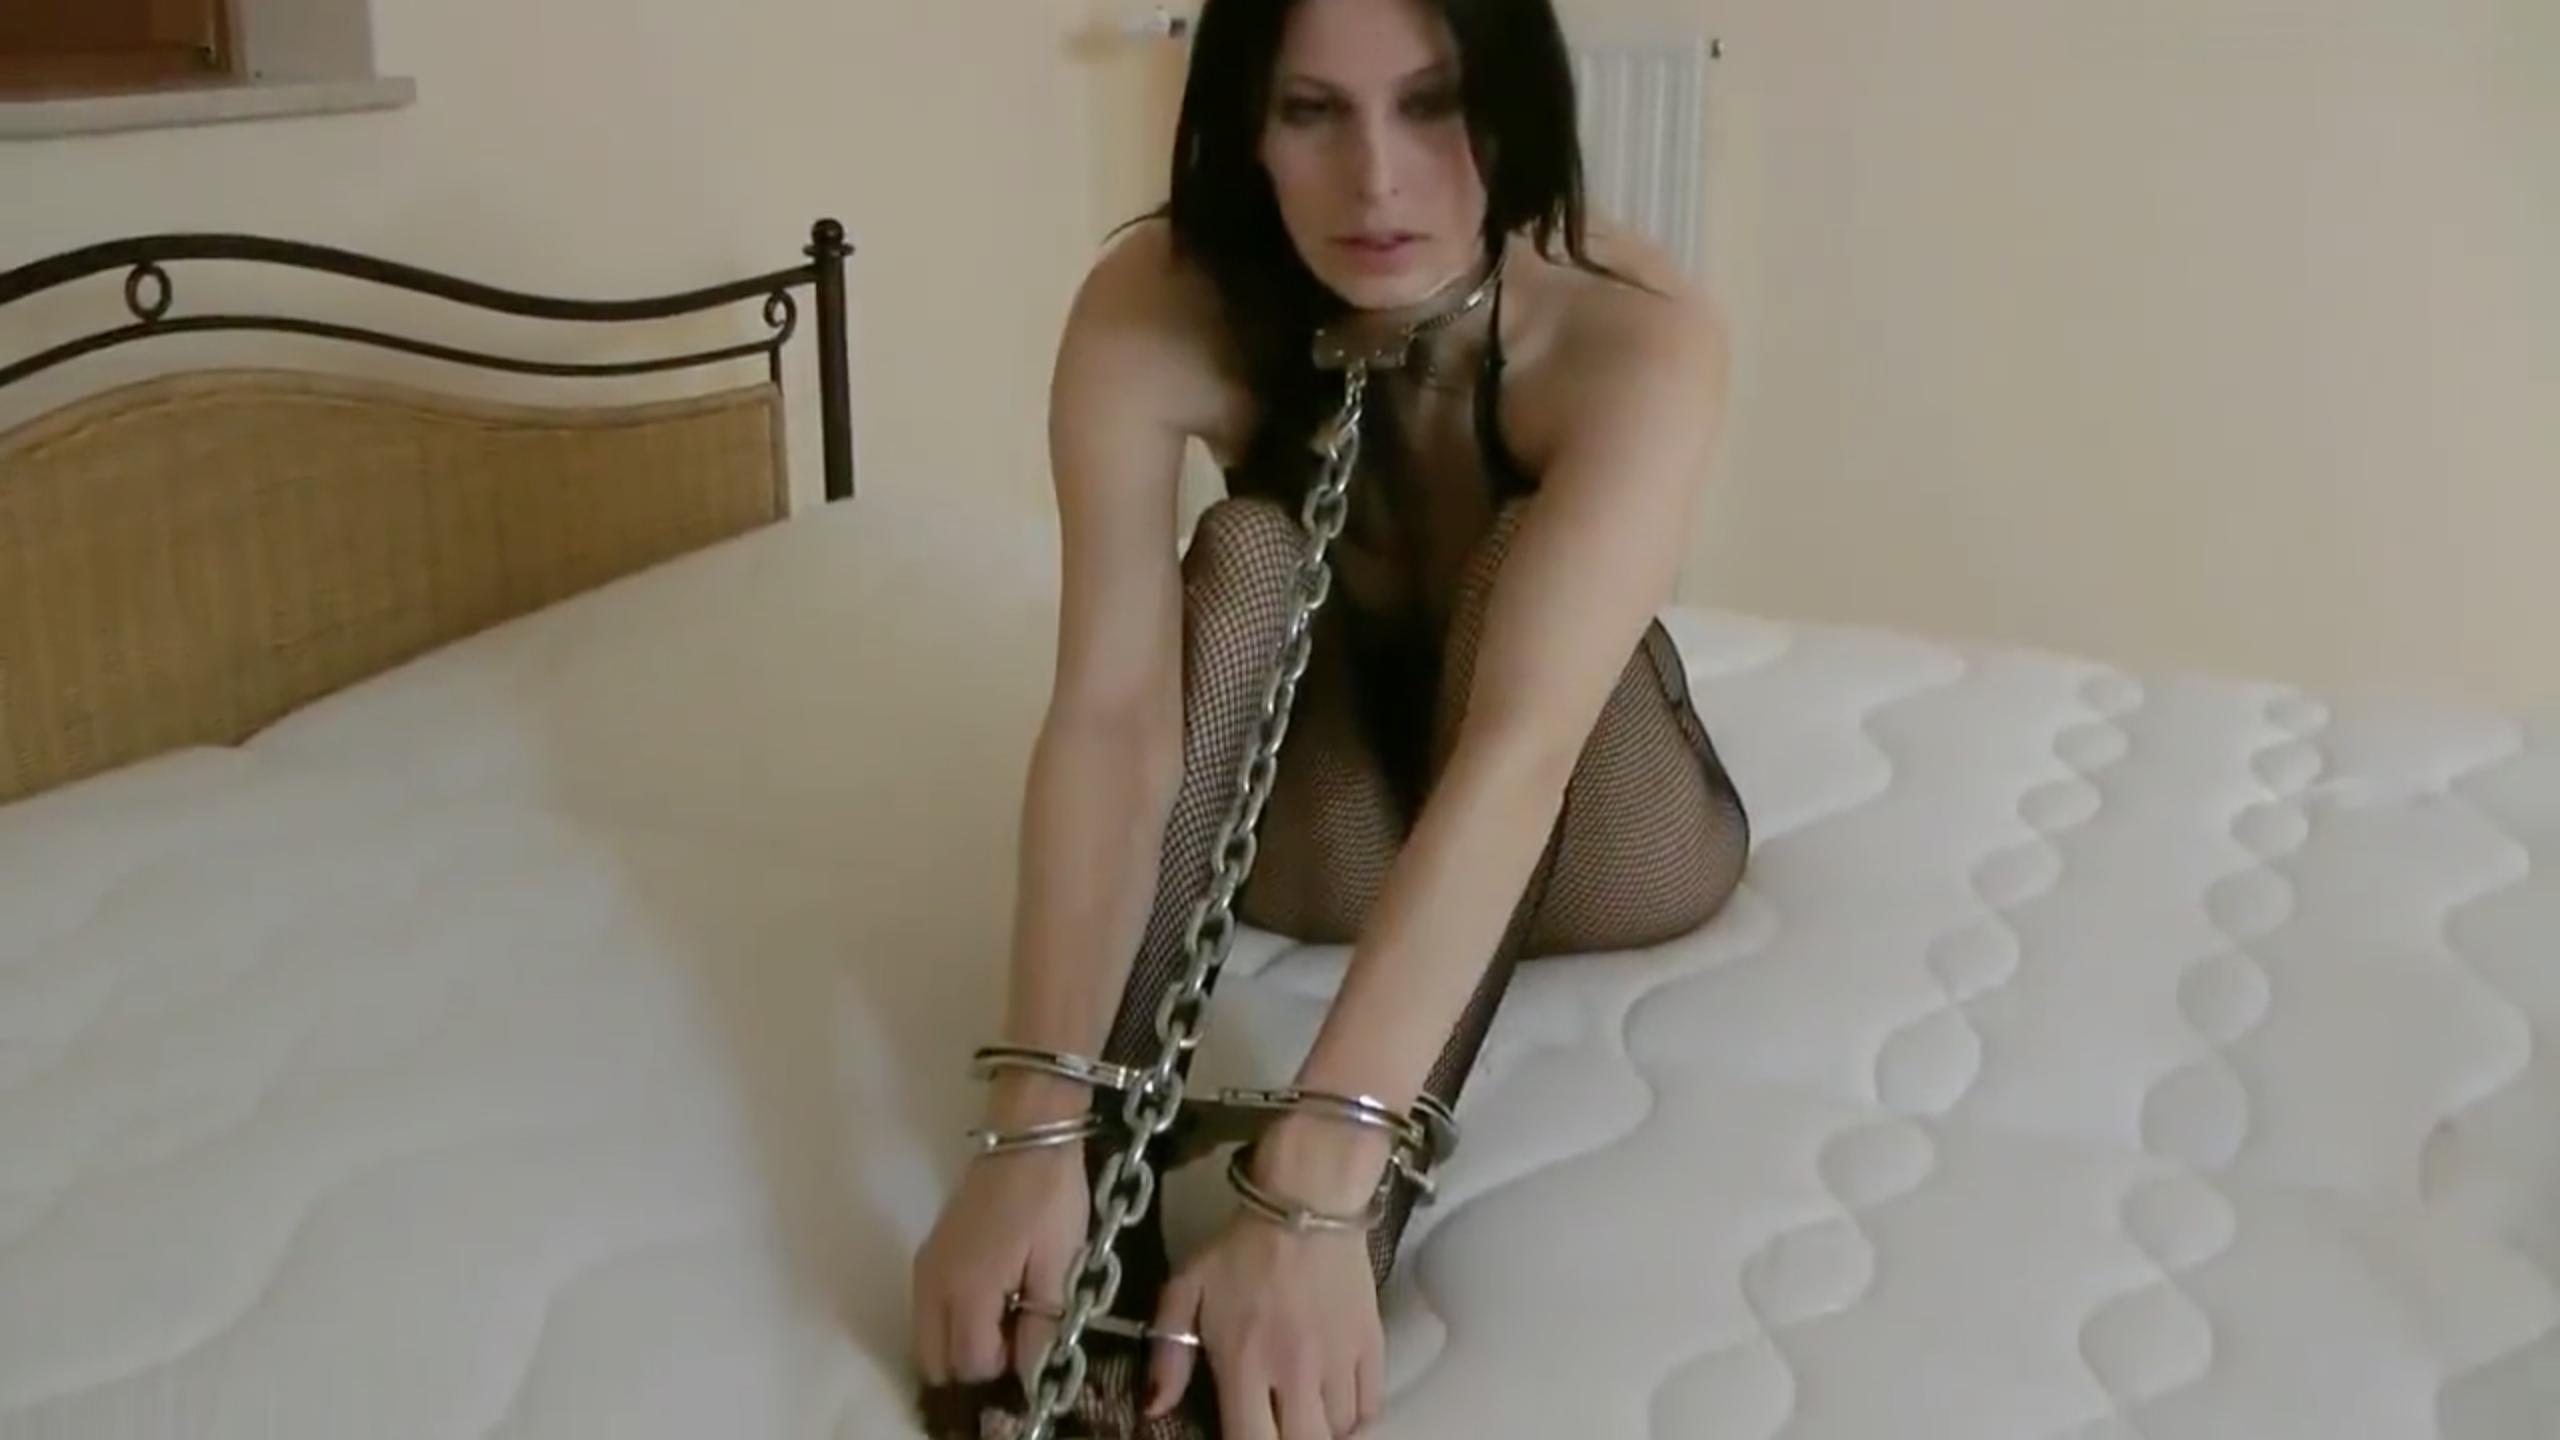 Metal bondage